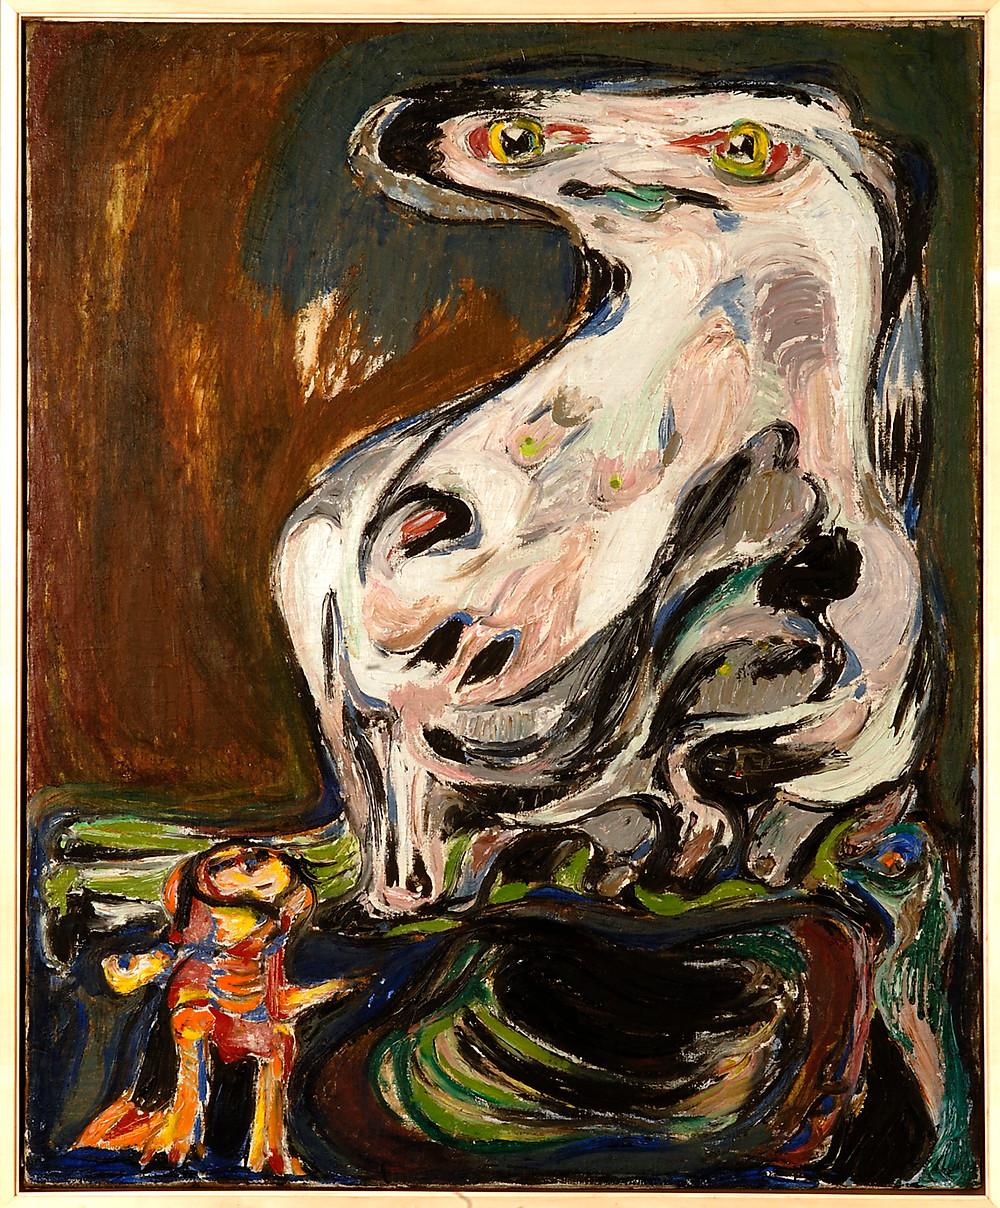 ASGER JORN, 'INTERPLANETARY WOMAN/FEMELLE INTERPLANÉTAIRE', 1953. KUNSTEN MUSEUM OF MODERN ART AALBORG. FOTO: NIELS FABAEK.